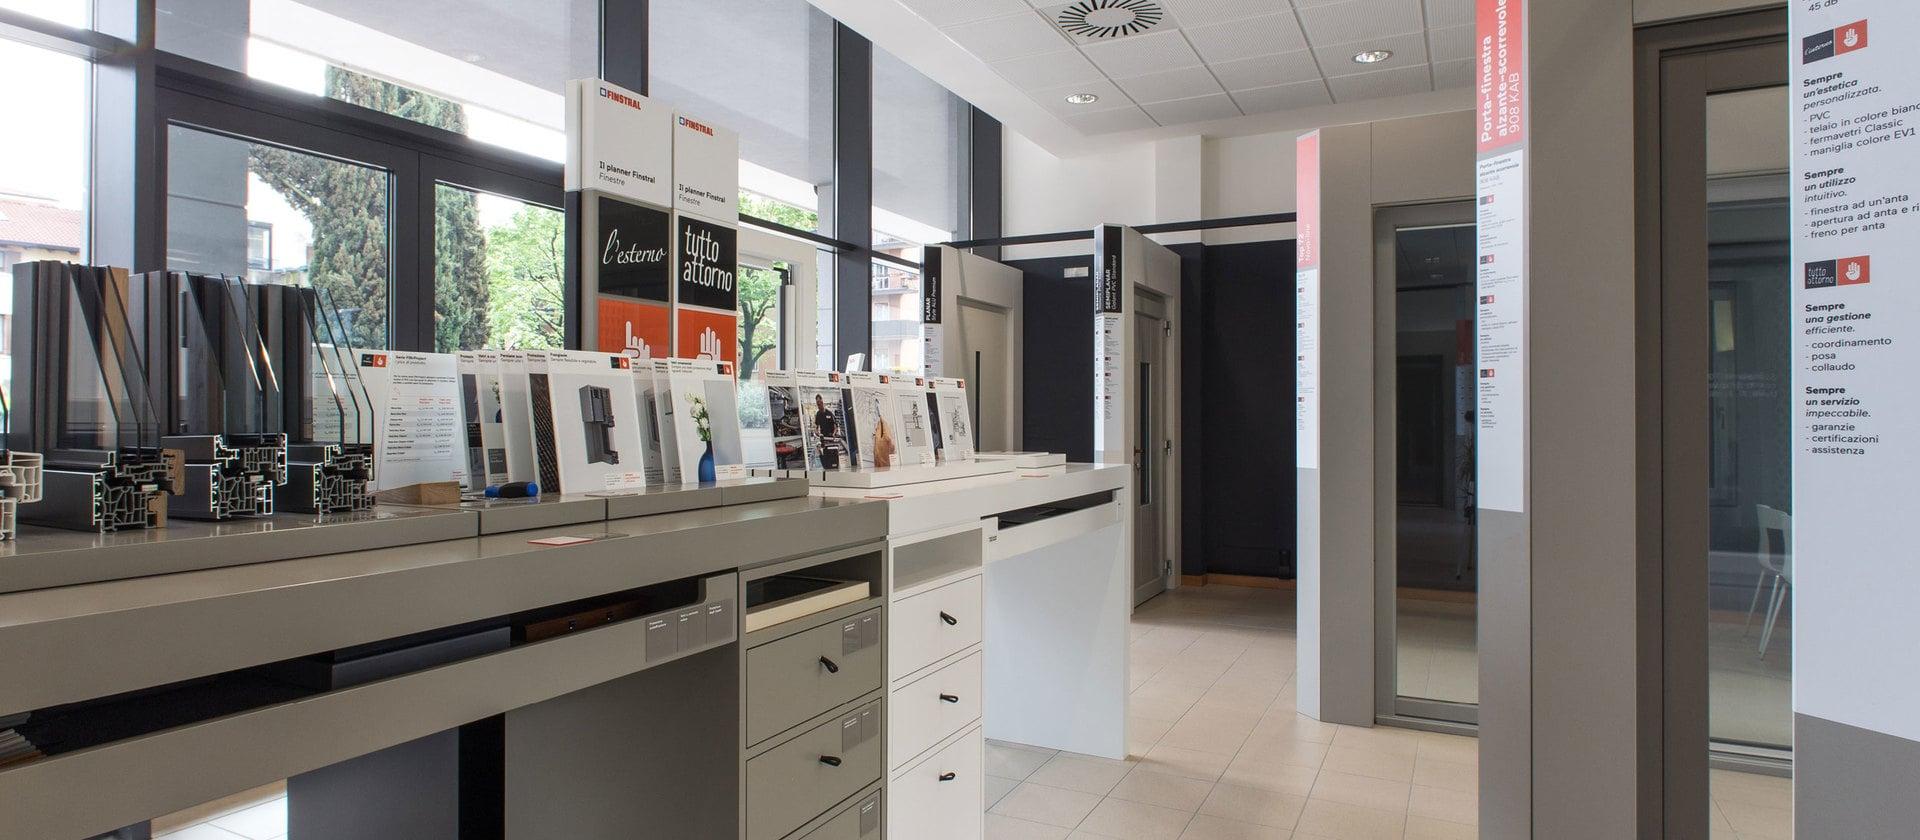 Studio Finstral Verona